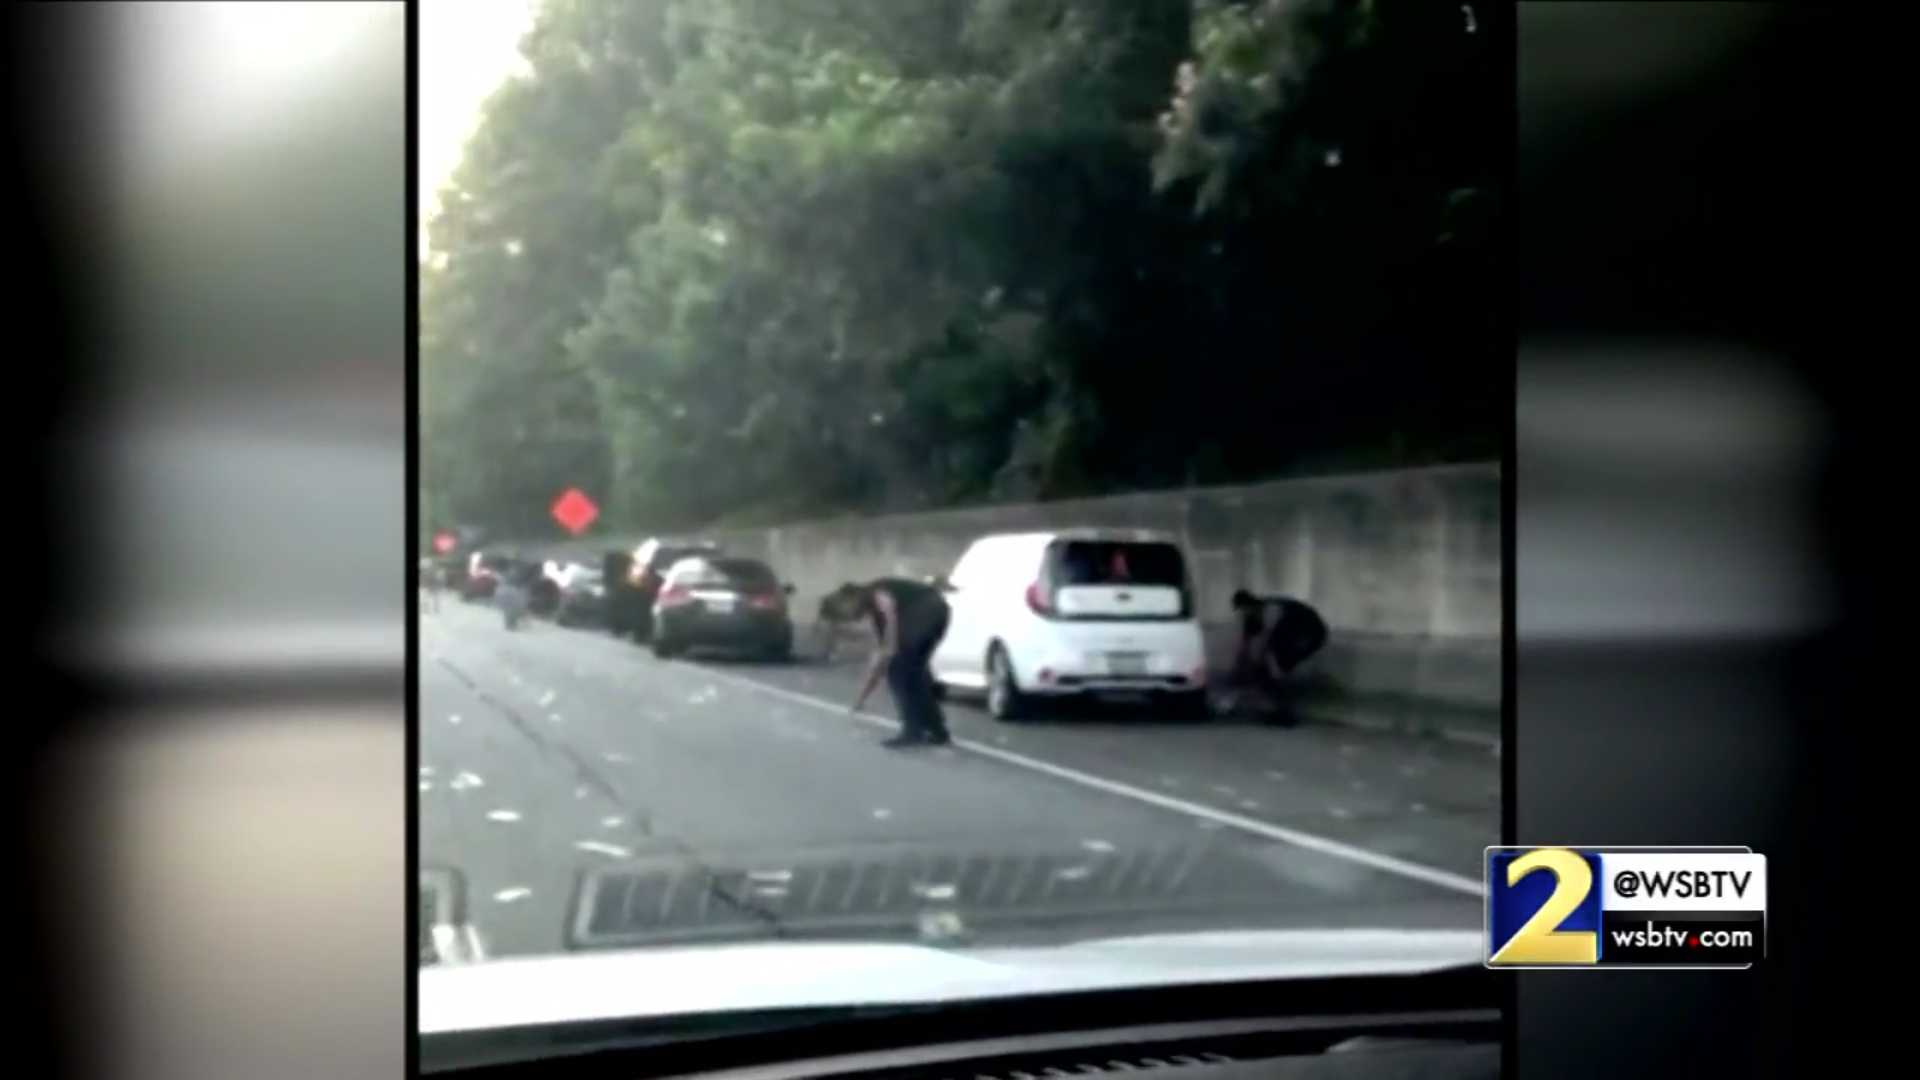 Vozači skupljaju novac rasut po putu (VIDEO)